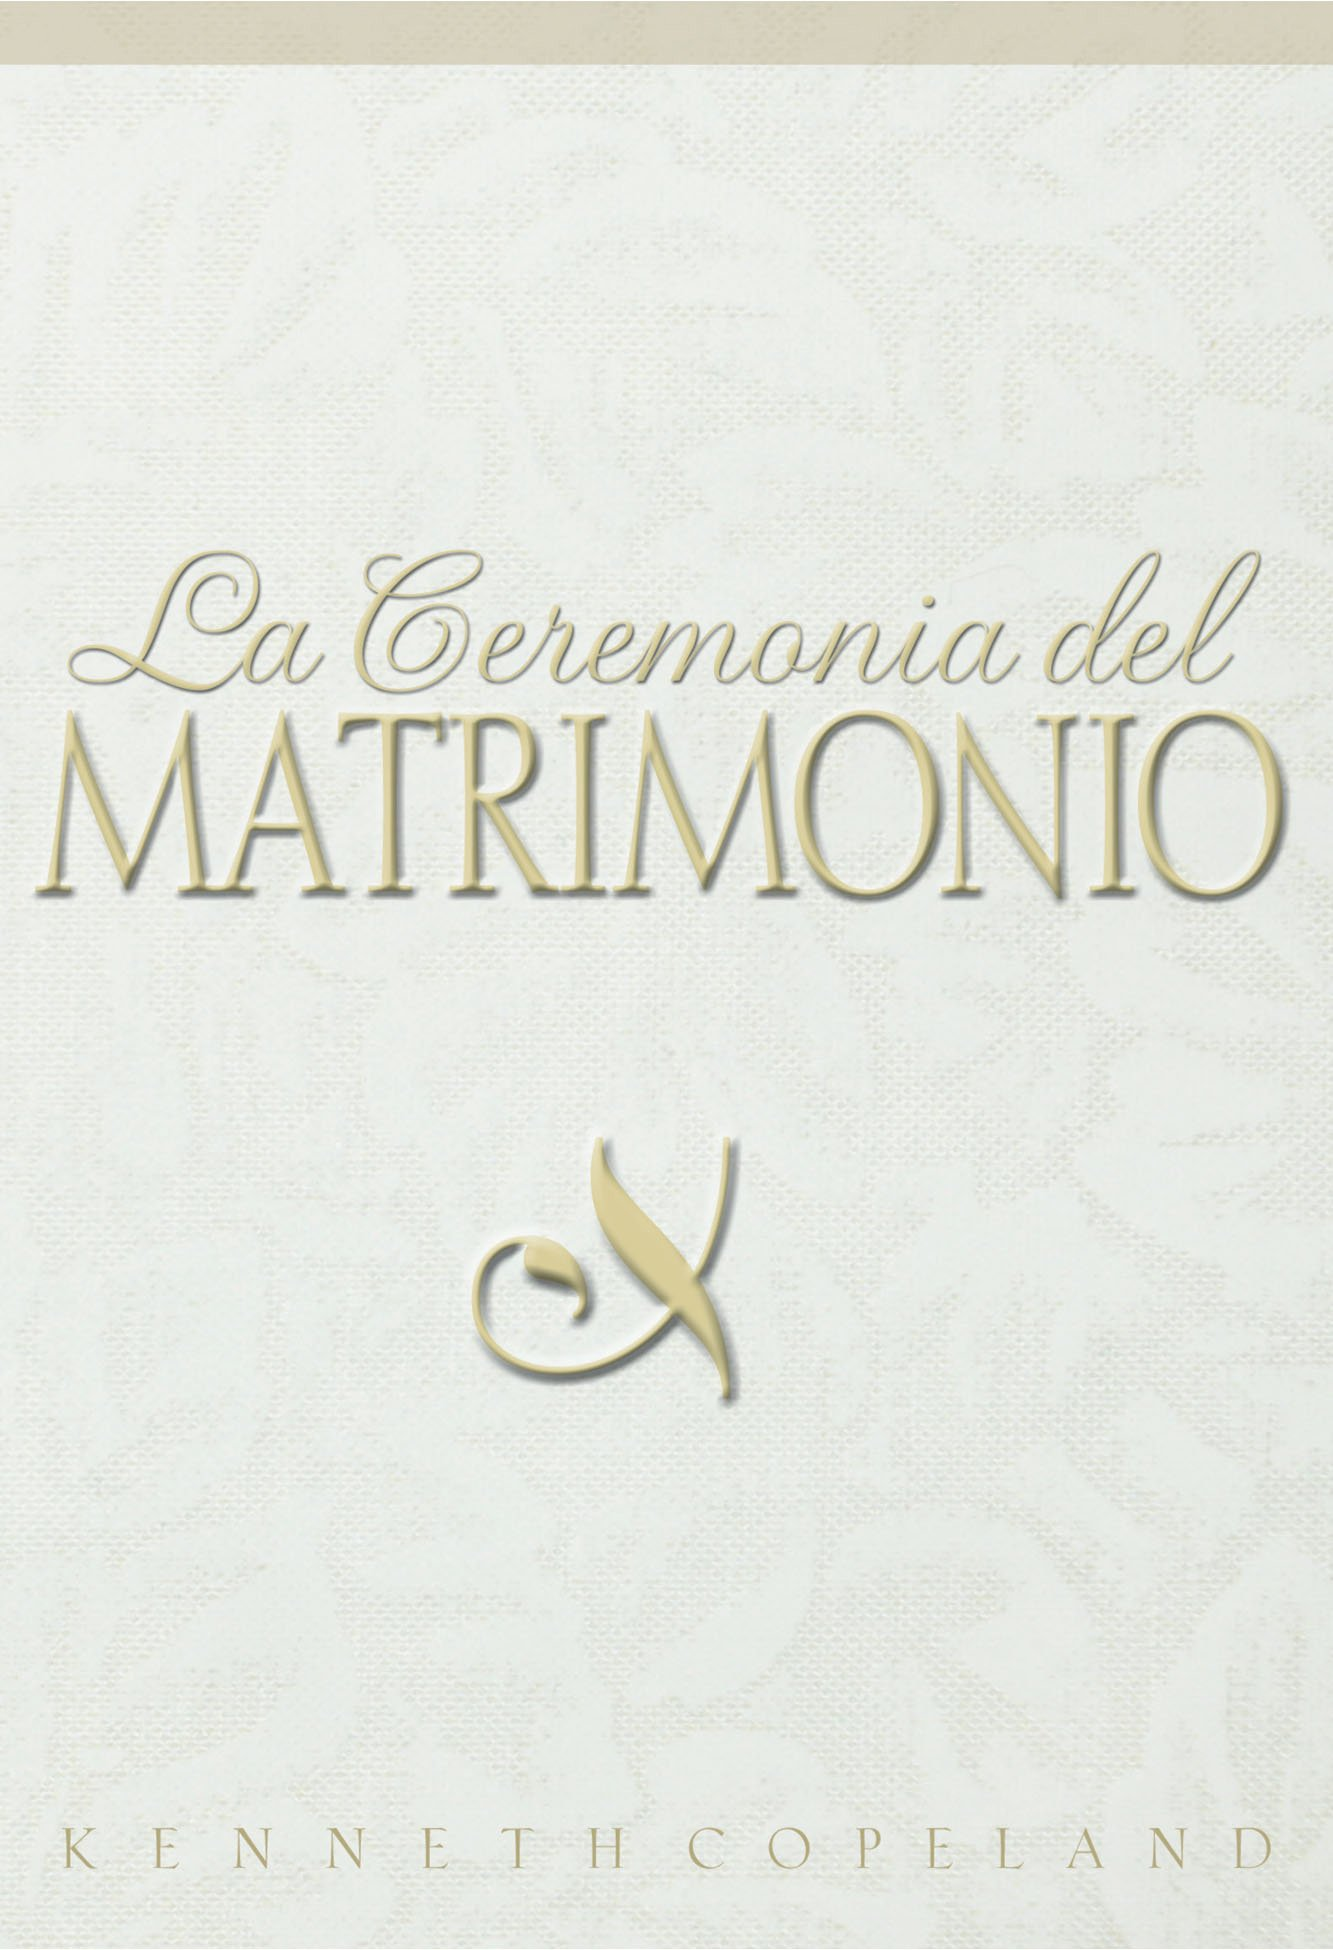 Download La Ceremonia del Matrimonio (Ceremony of Marriage) pdf